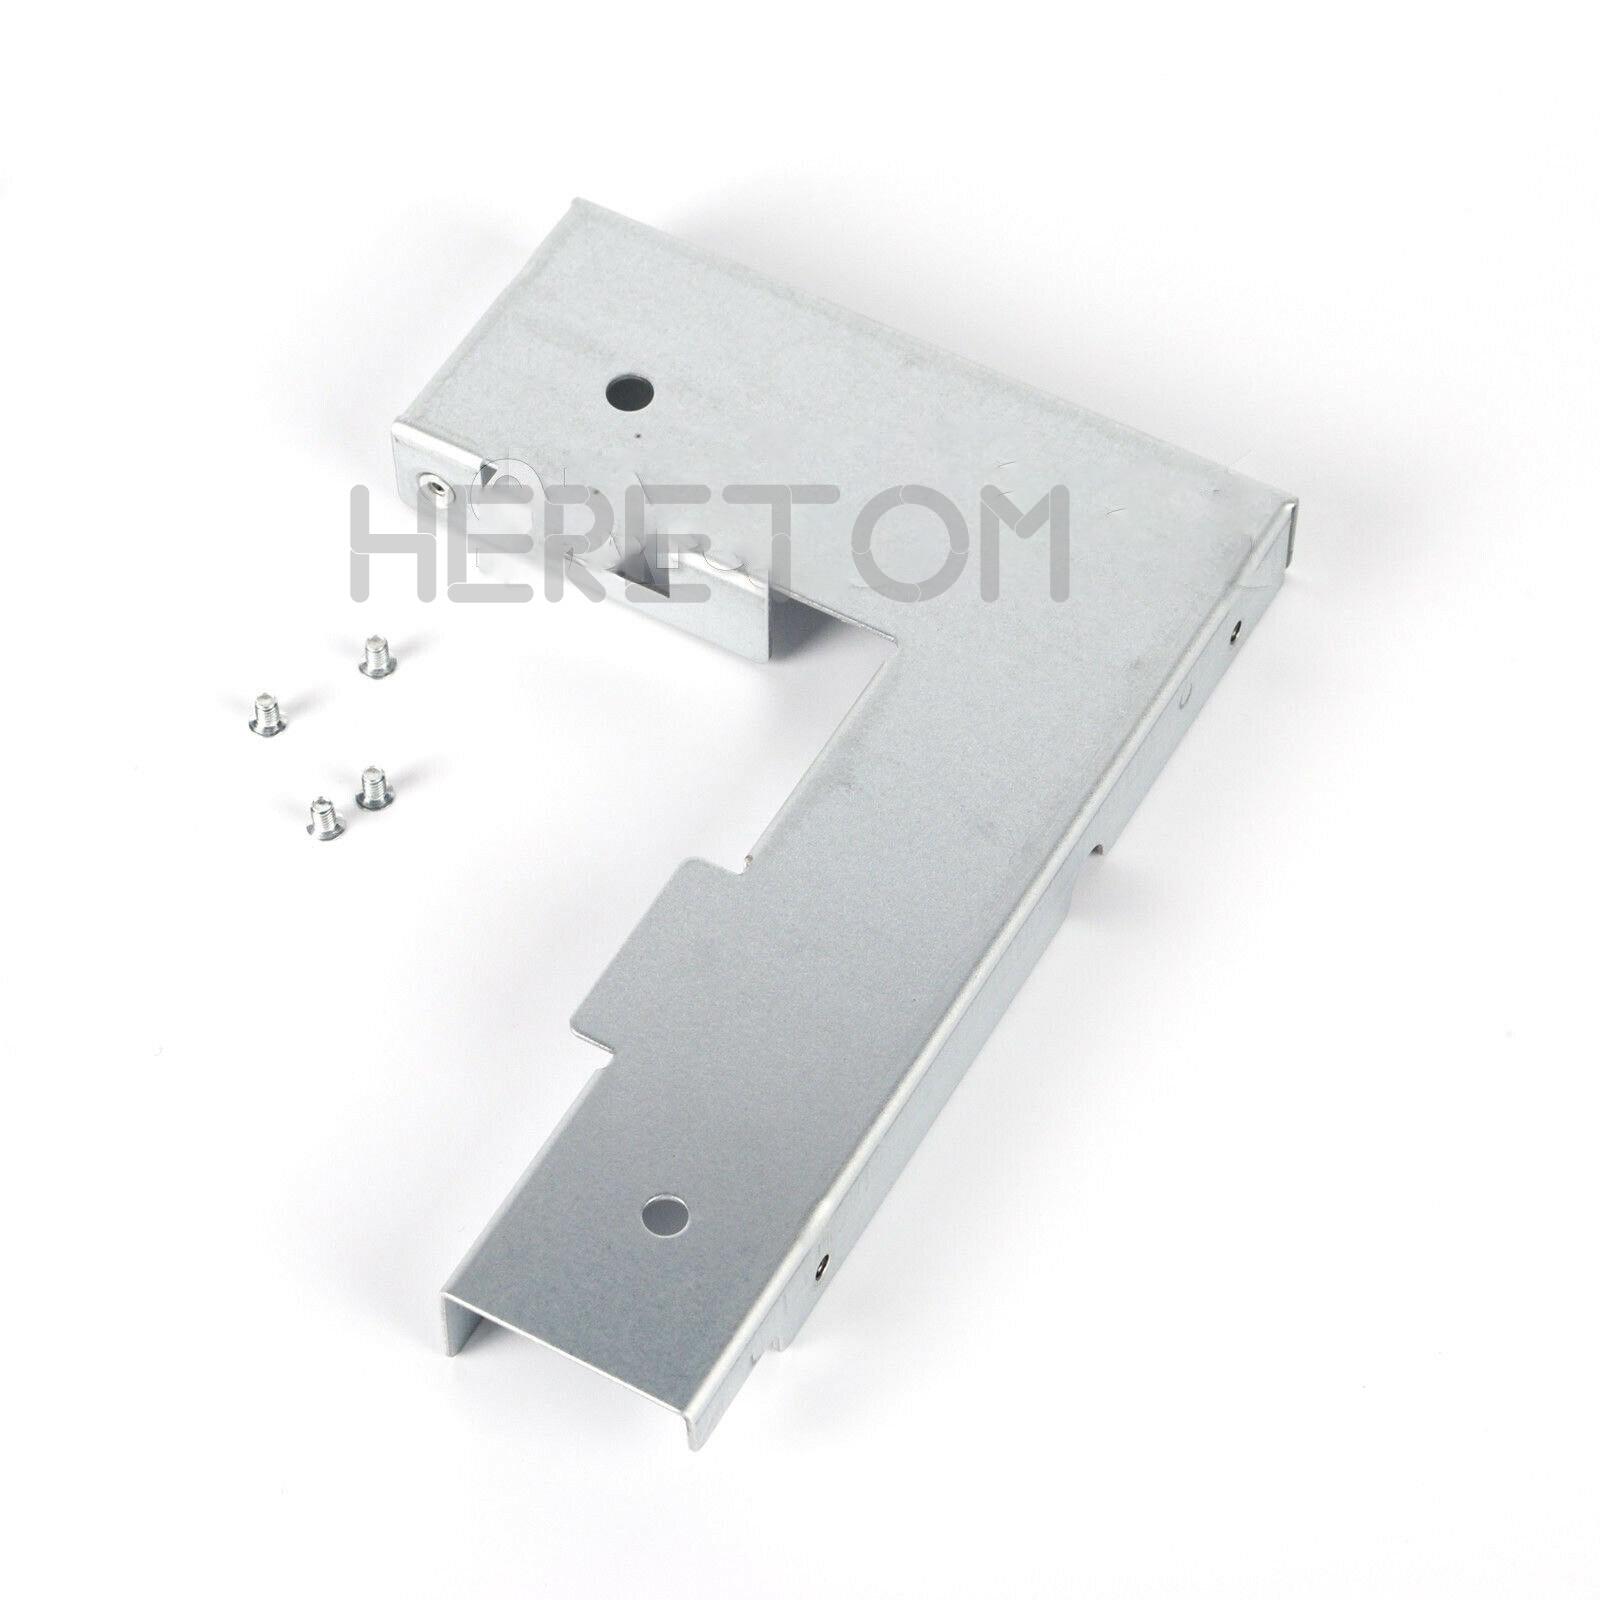 Heretom FRU00FC28 2.5